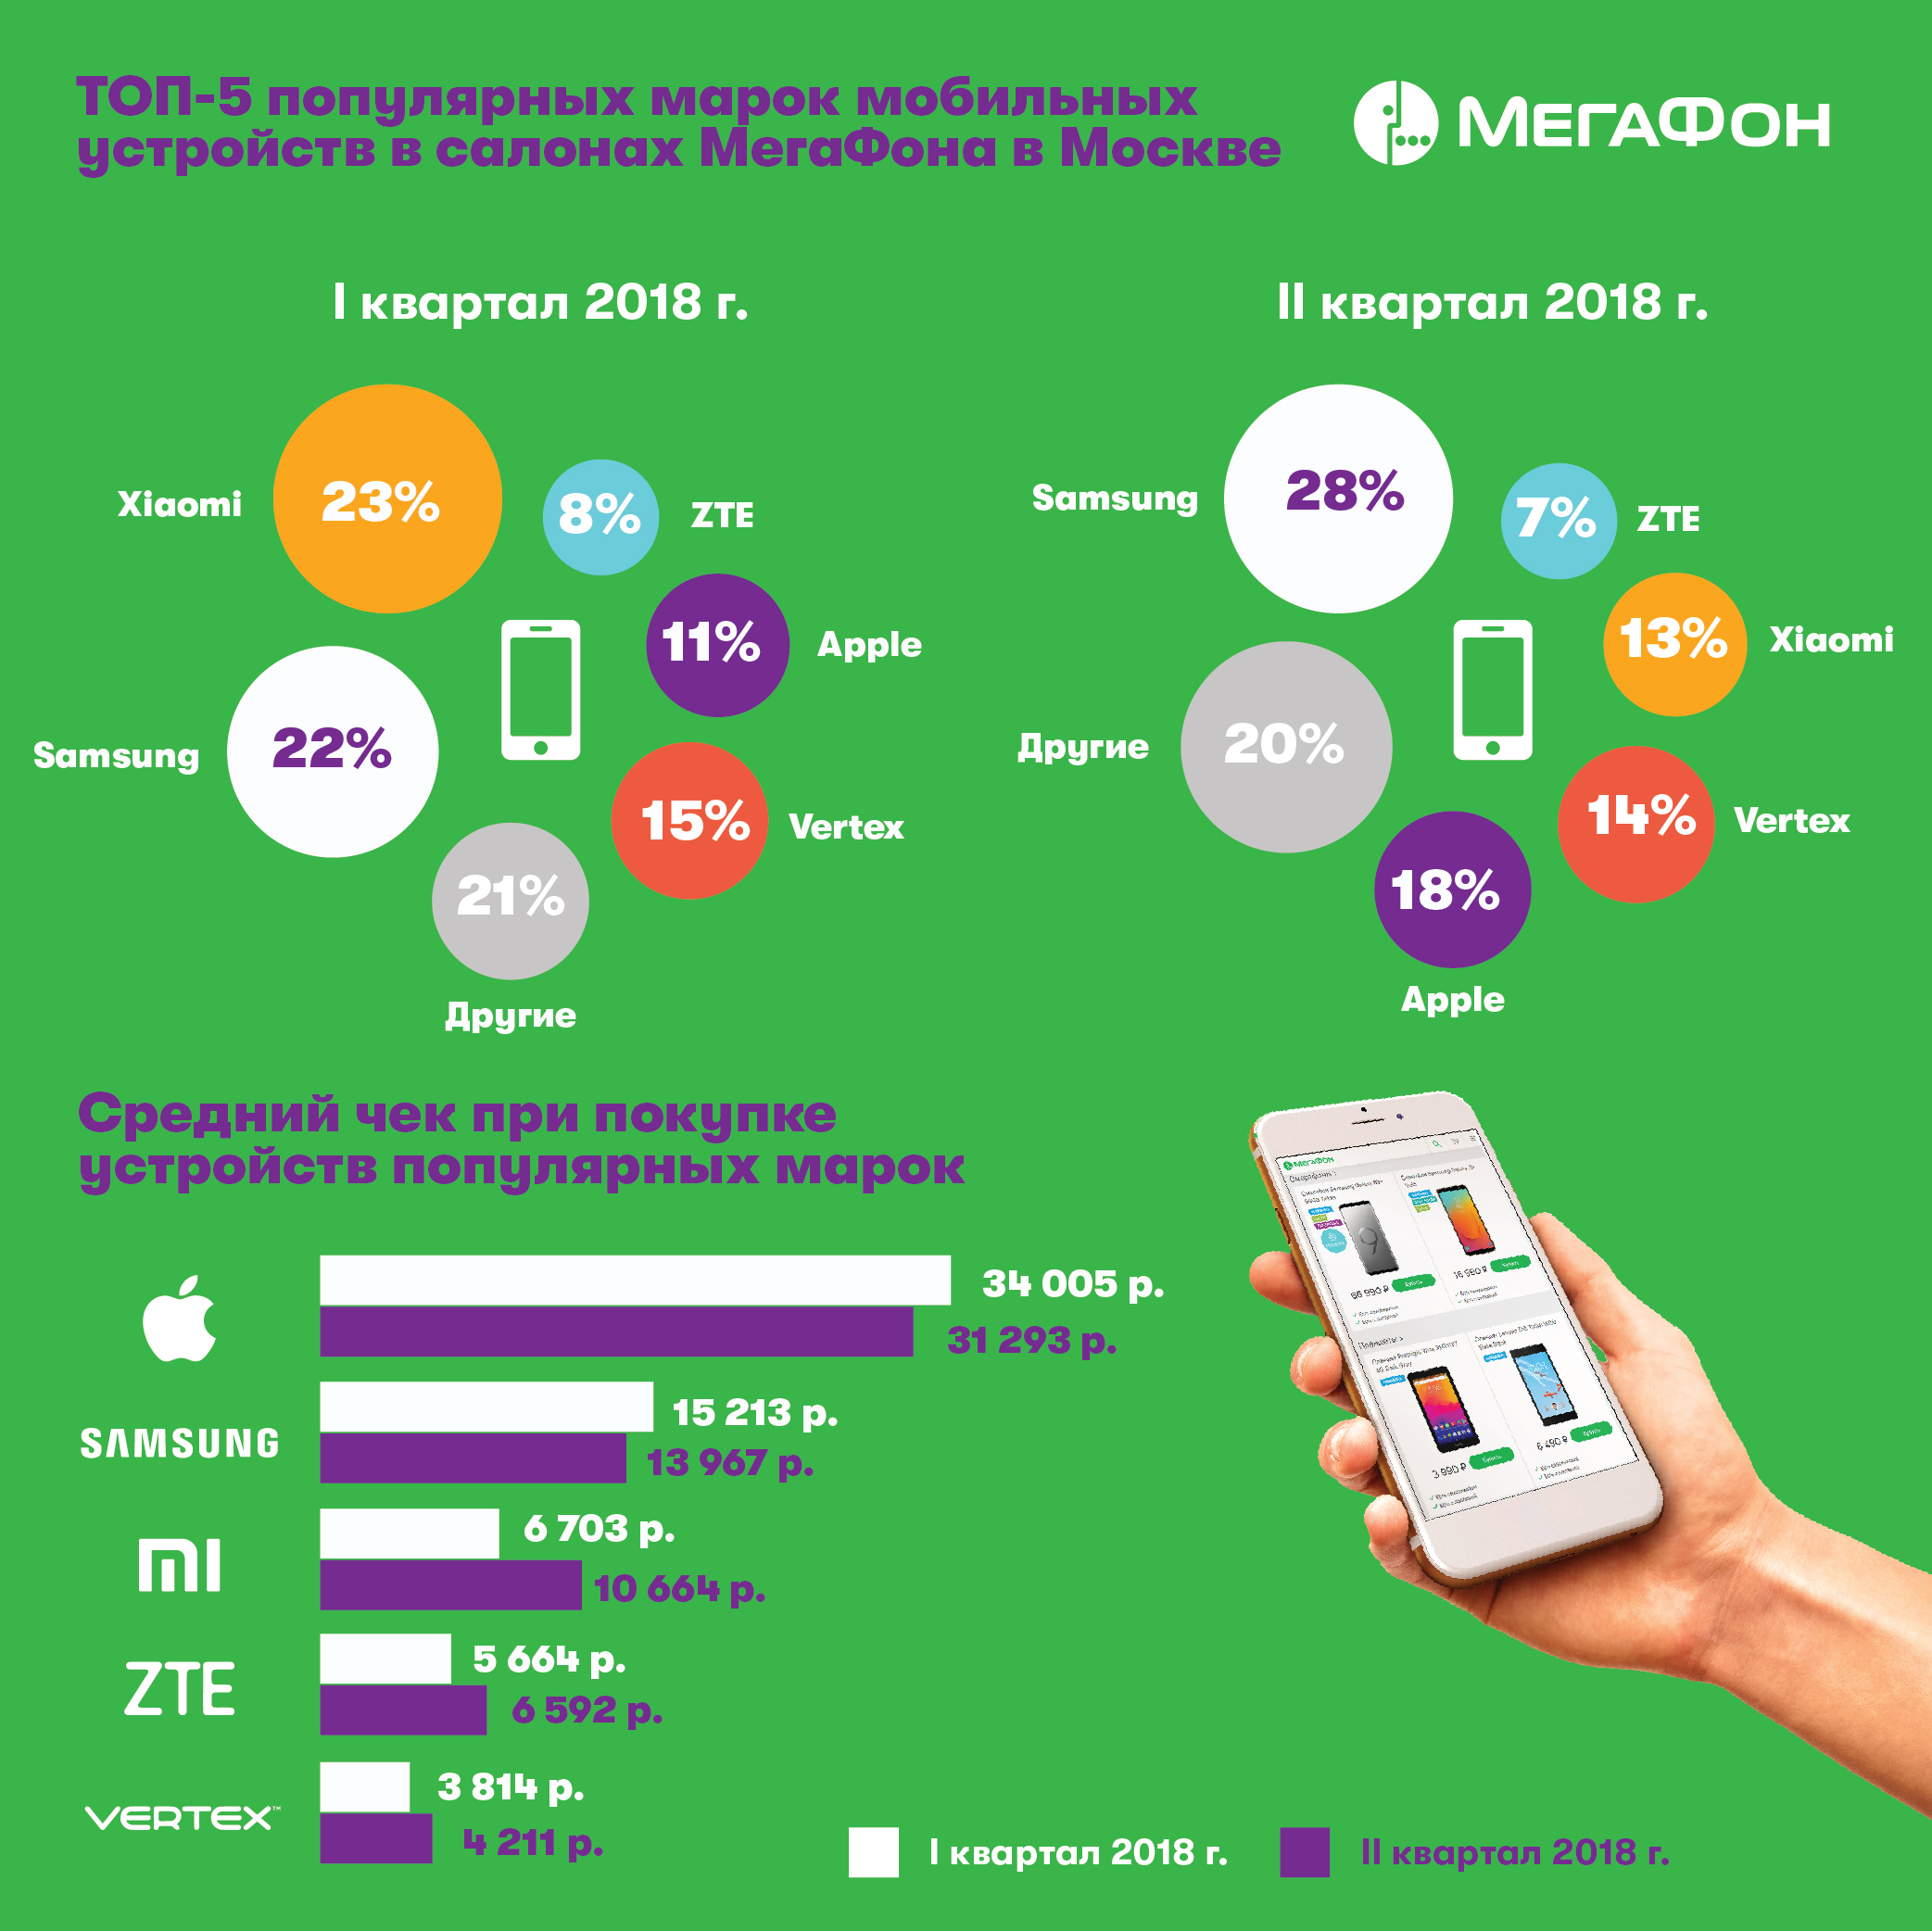 продажи 4G смартфонов мегафон